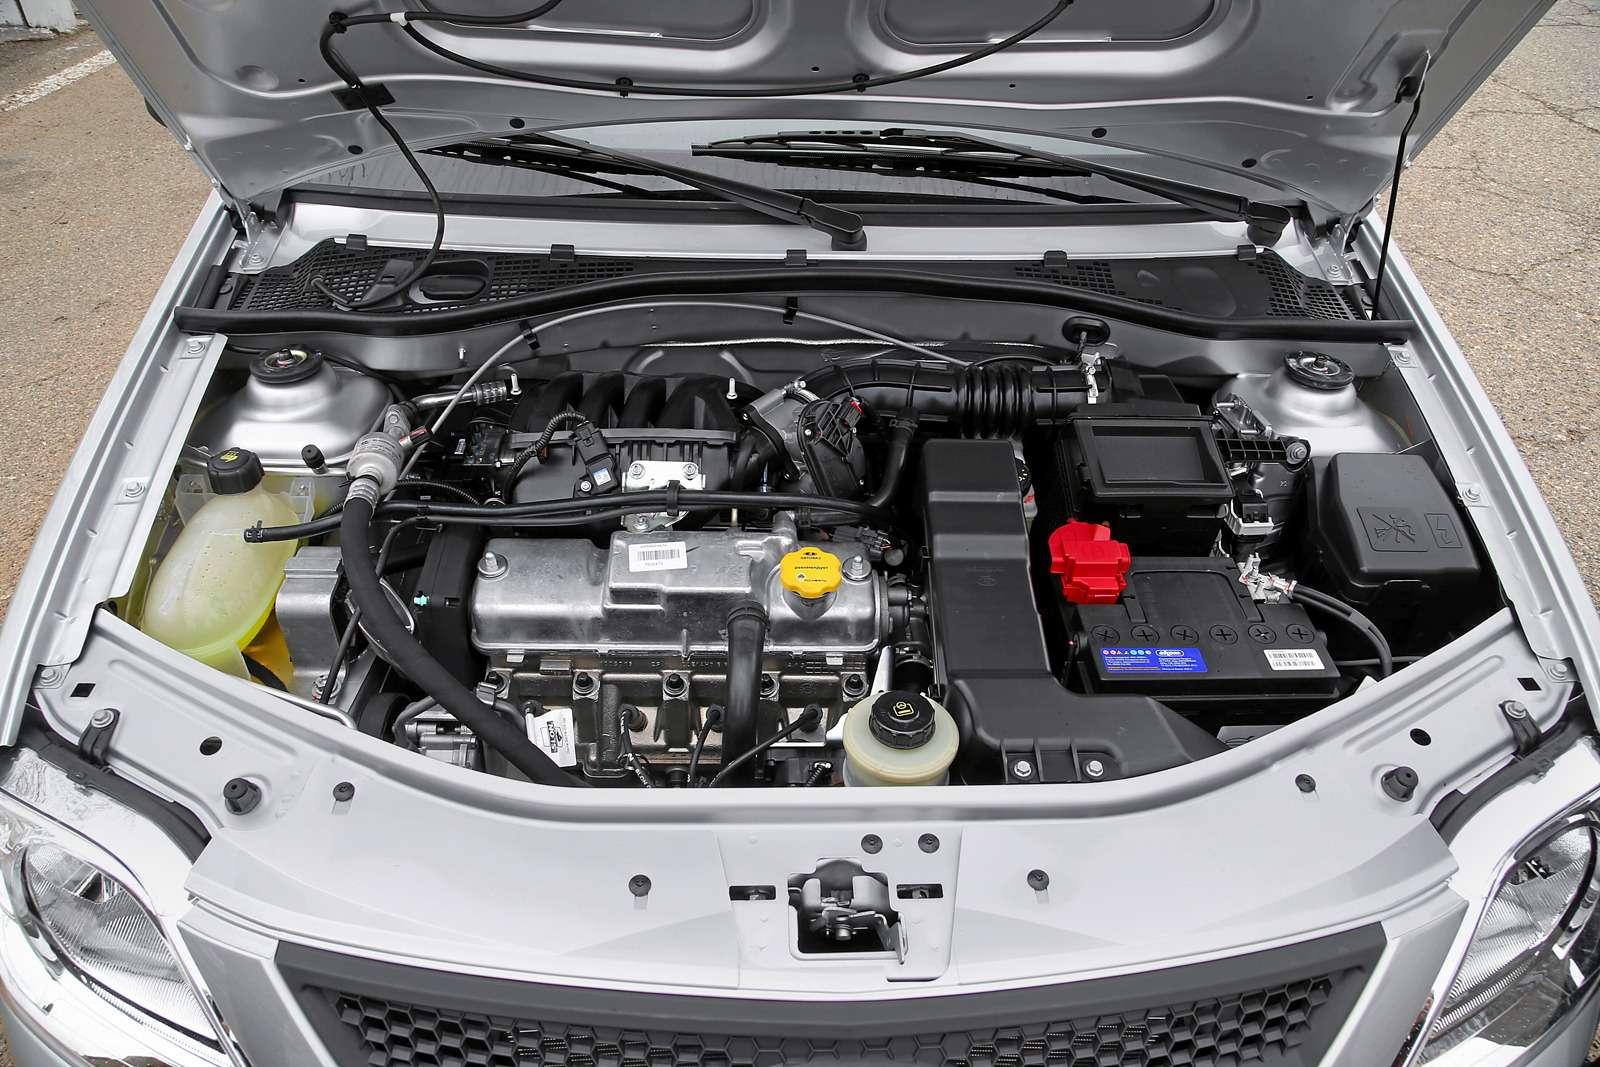 Lada Largus сдвигателем ВАЗ-11189: плюс три силы зарубли— фото 605456